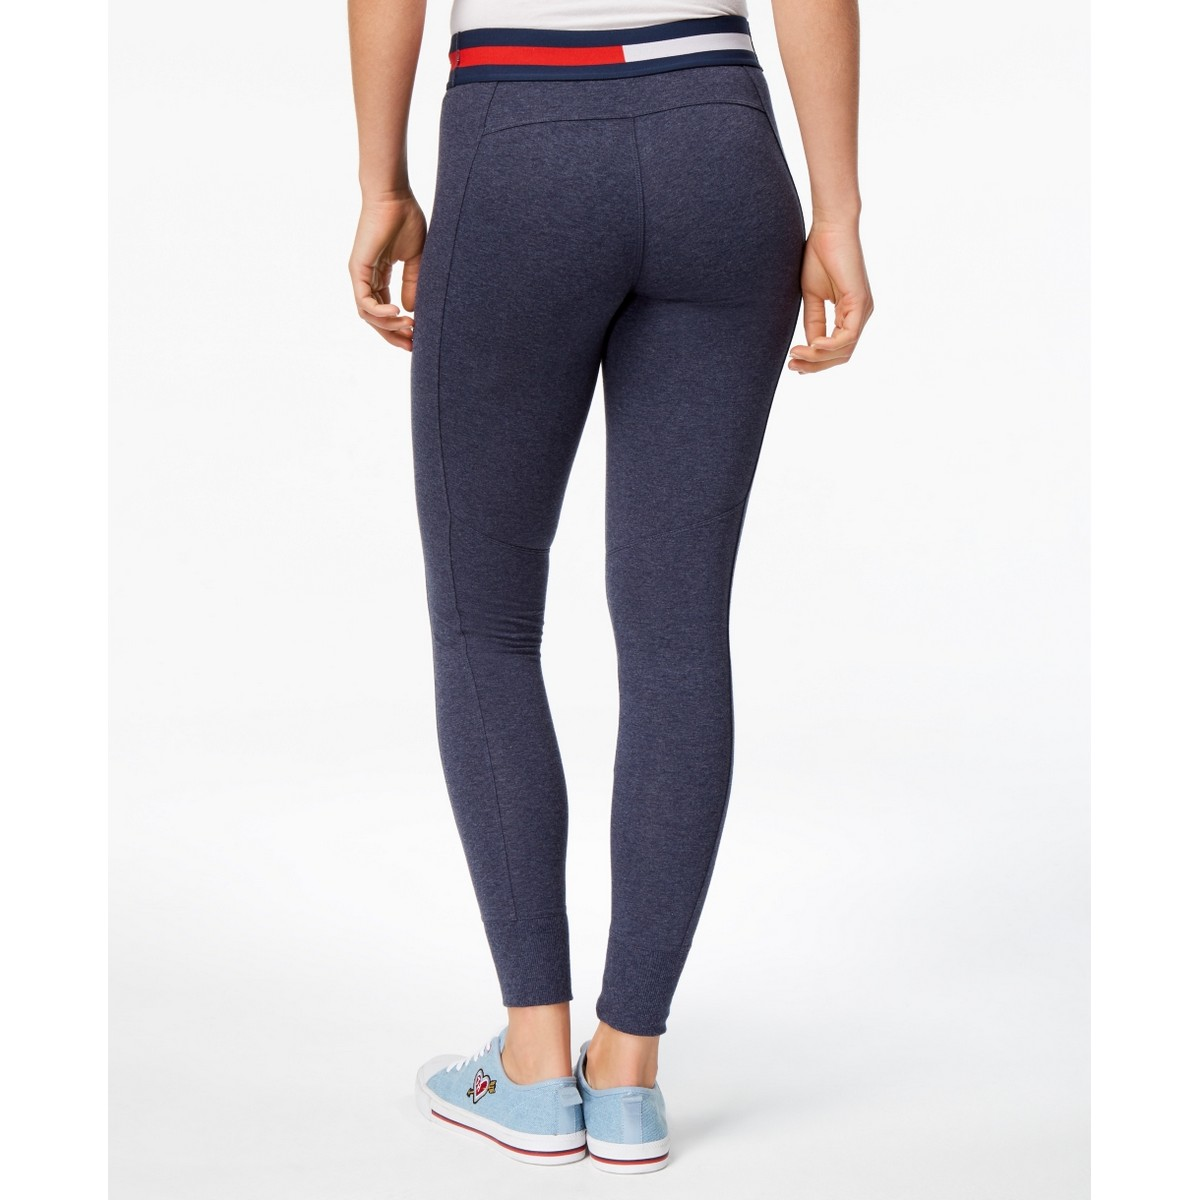 TOMMY HILFIGER NEW Women/'s Sport Logo Leggings TEDO